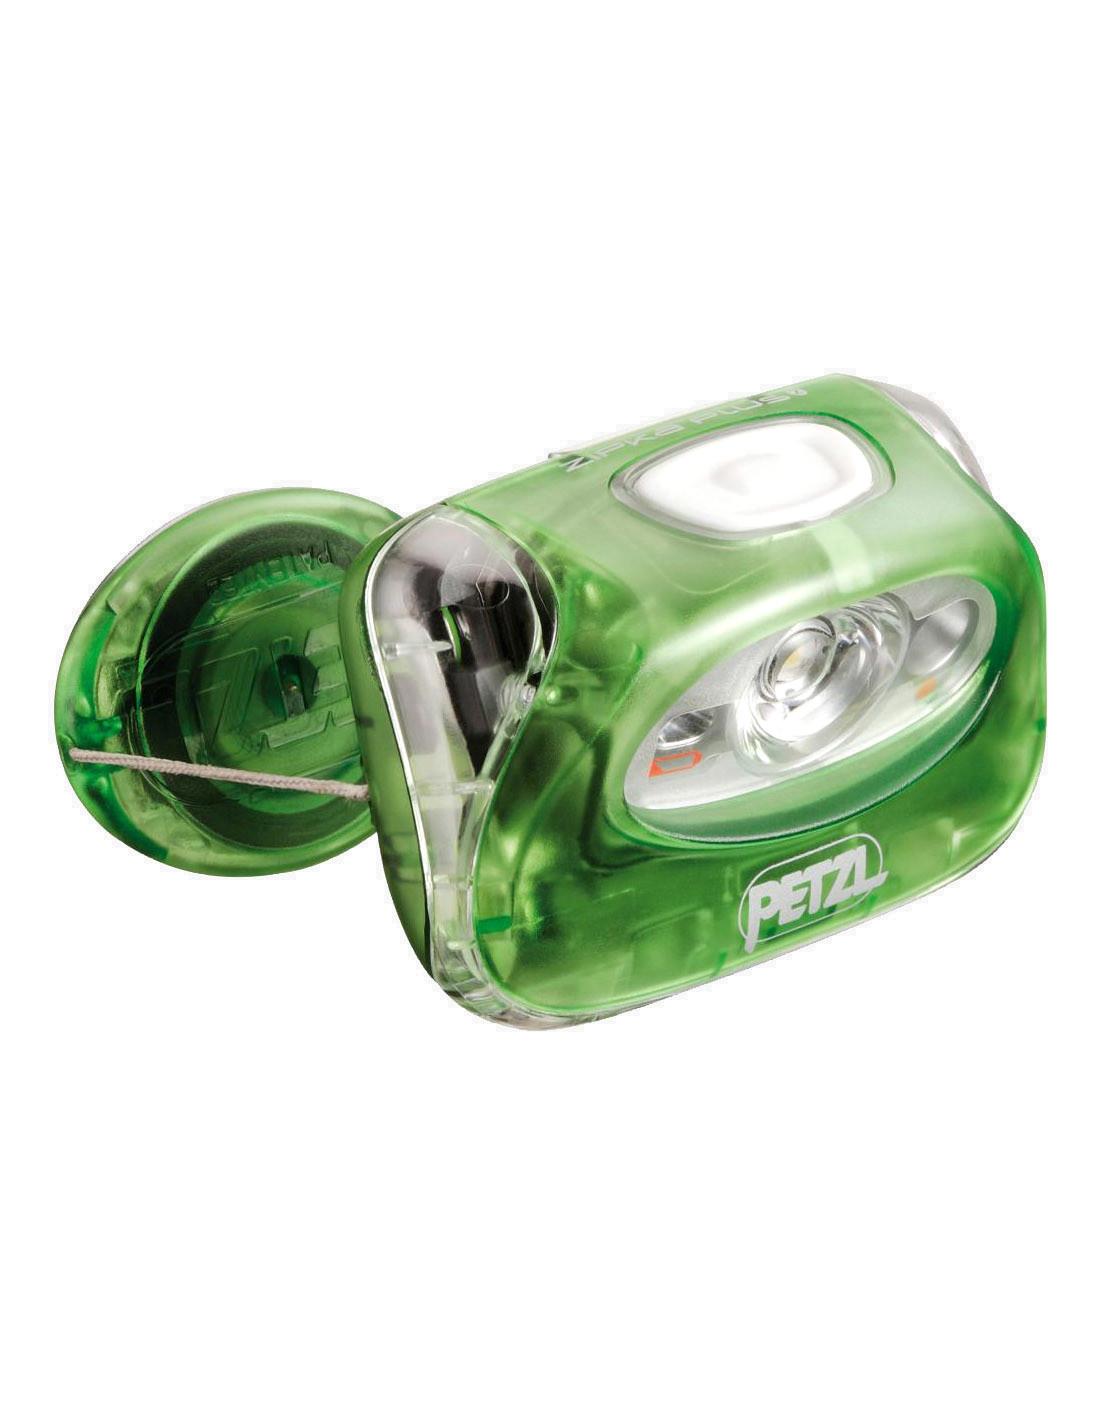 Lampe Frontale Zipka Plus 2 Petzl Couleur Vert